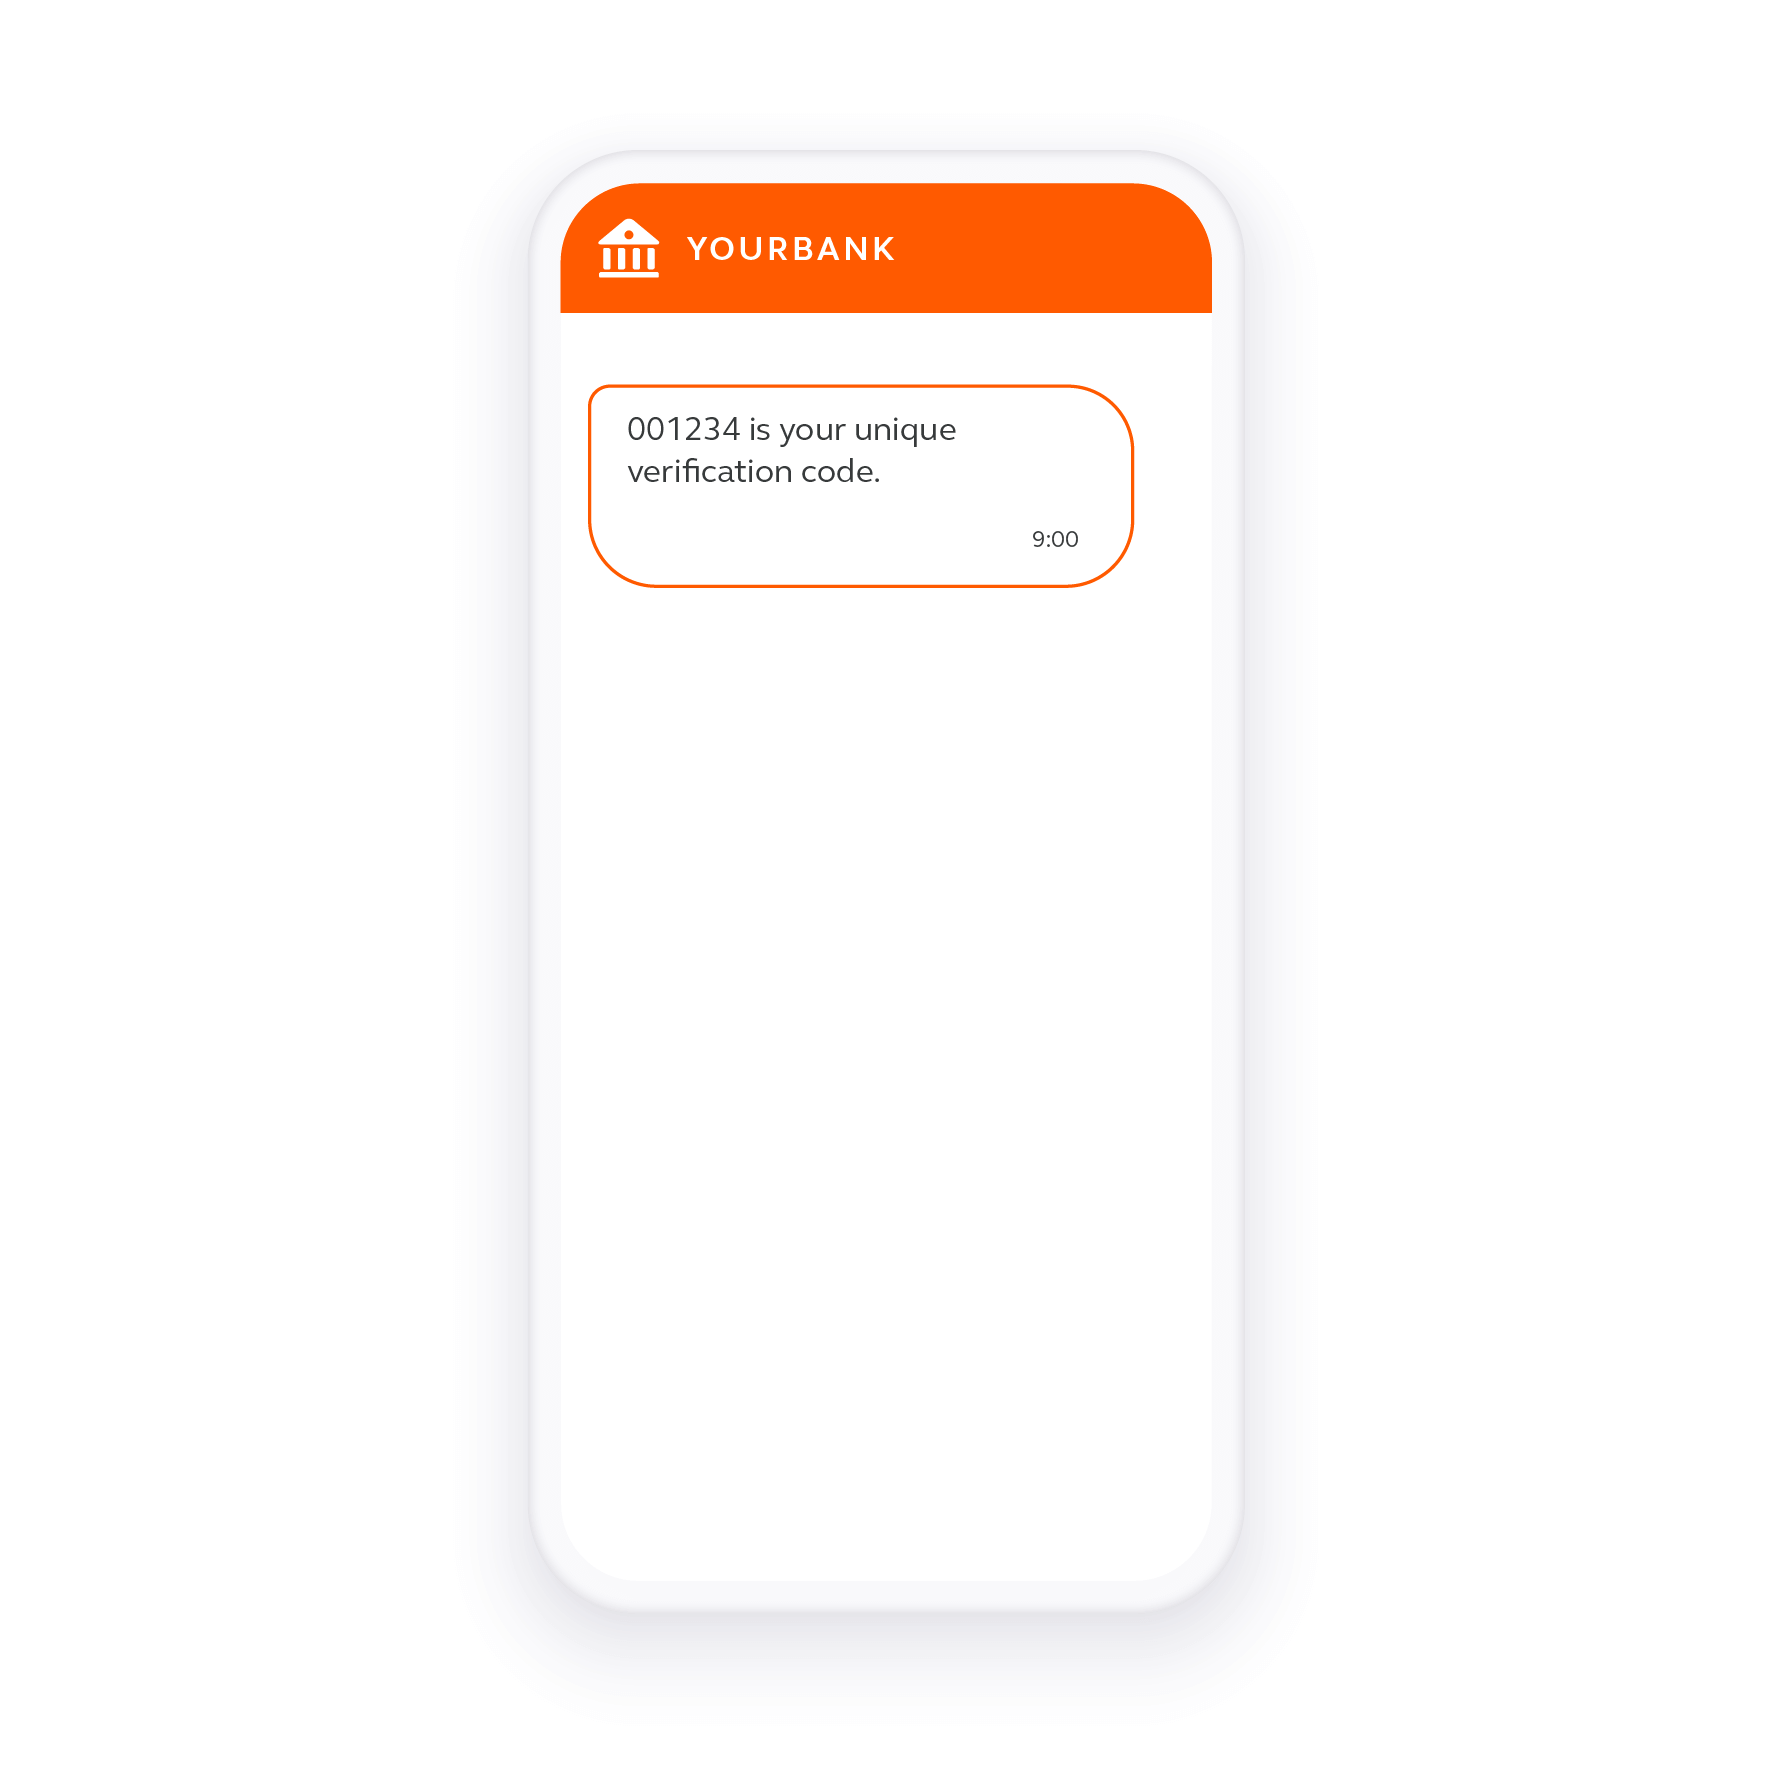 2FA_verification_code